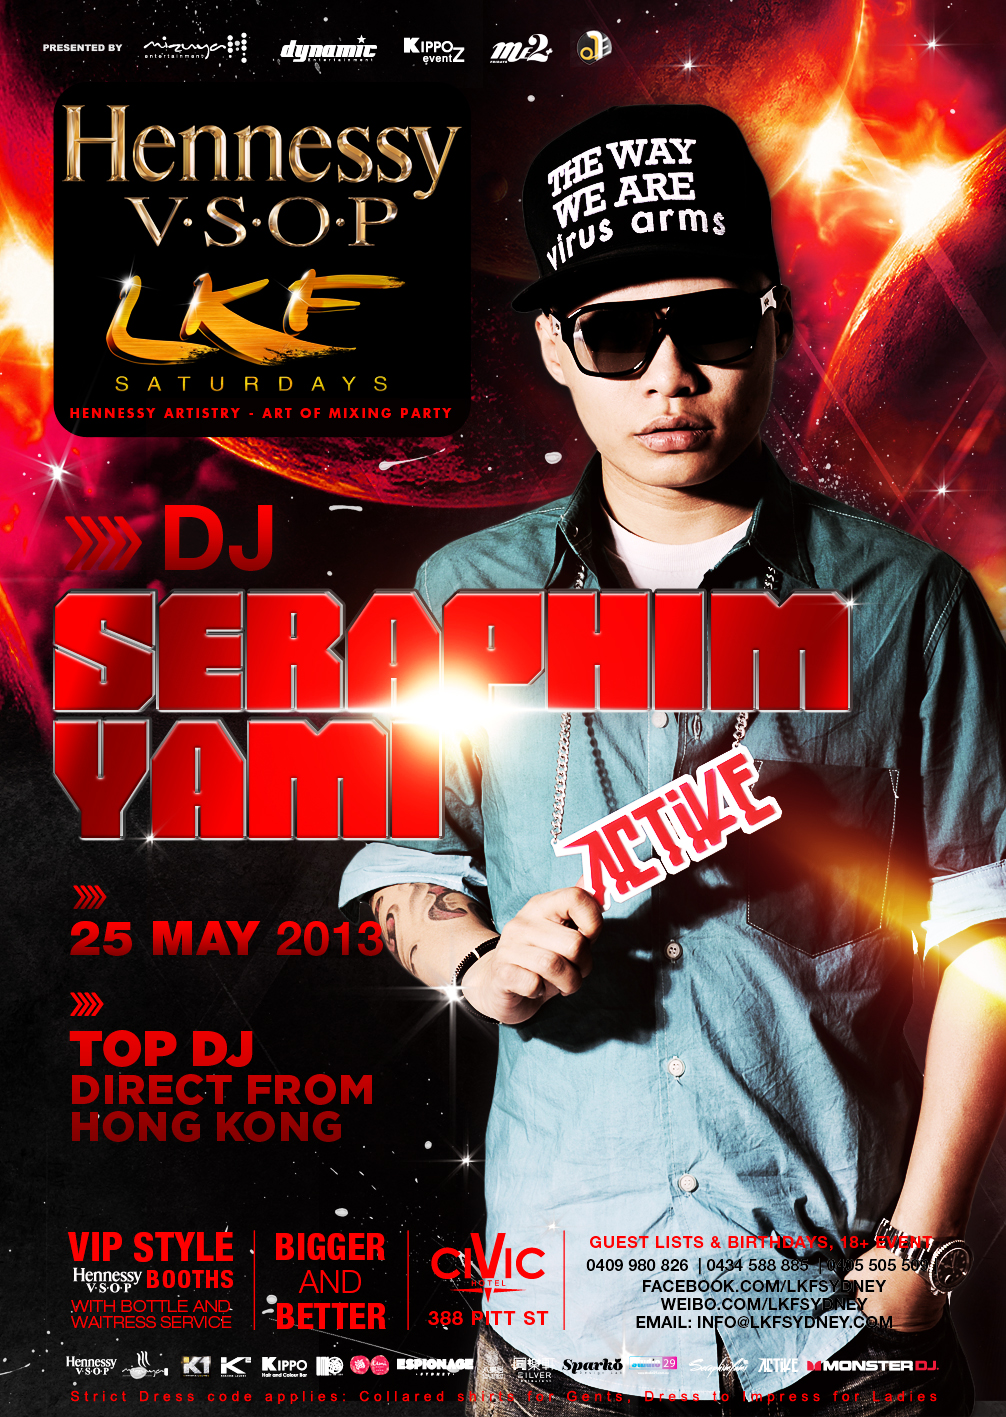 LKF DJ YAMI 25 MAY POSTER.jpg